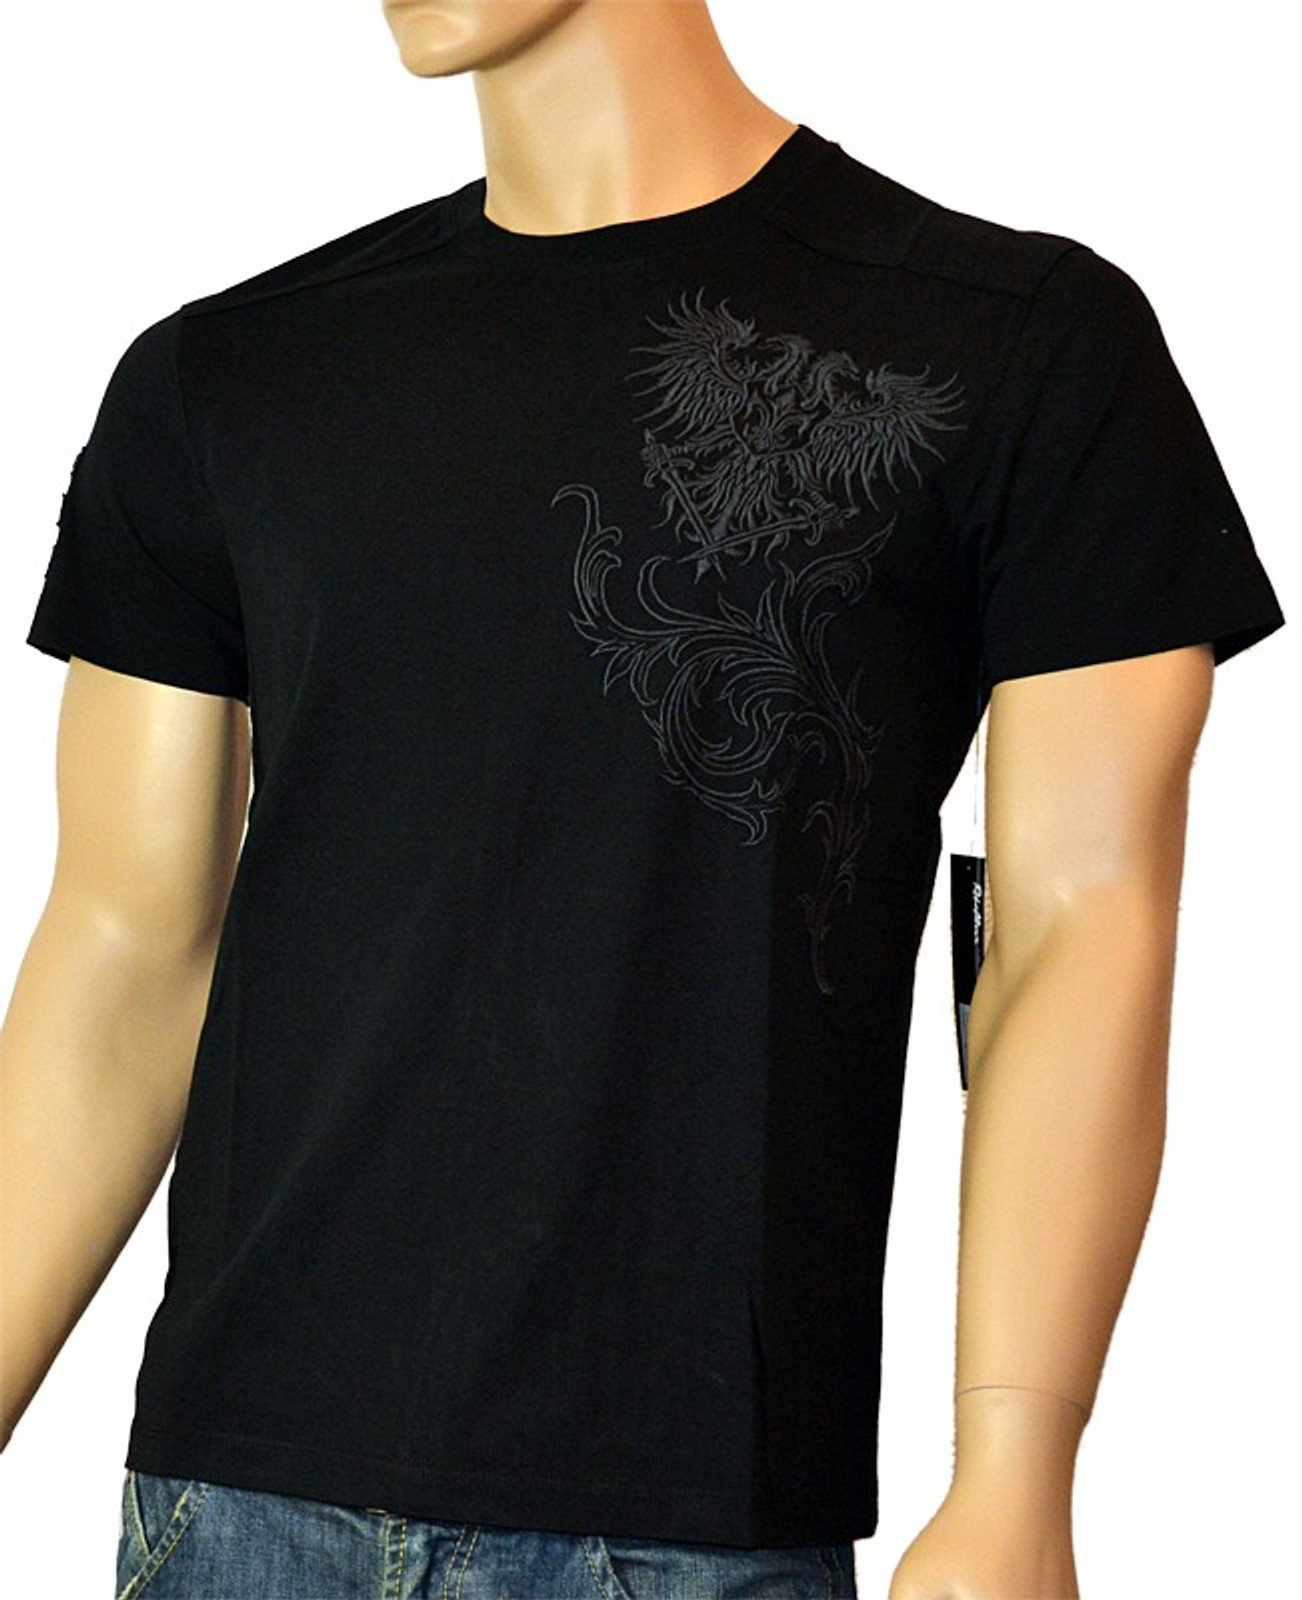 Rebel Spirit Herren T-Shirt Rebellious Elegance in Schwarz